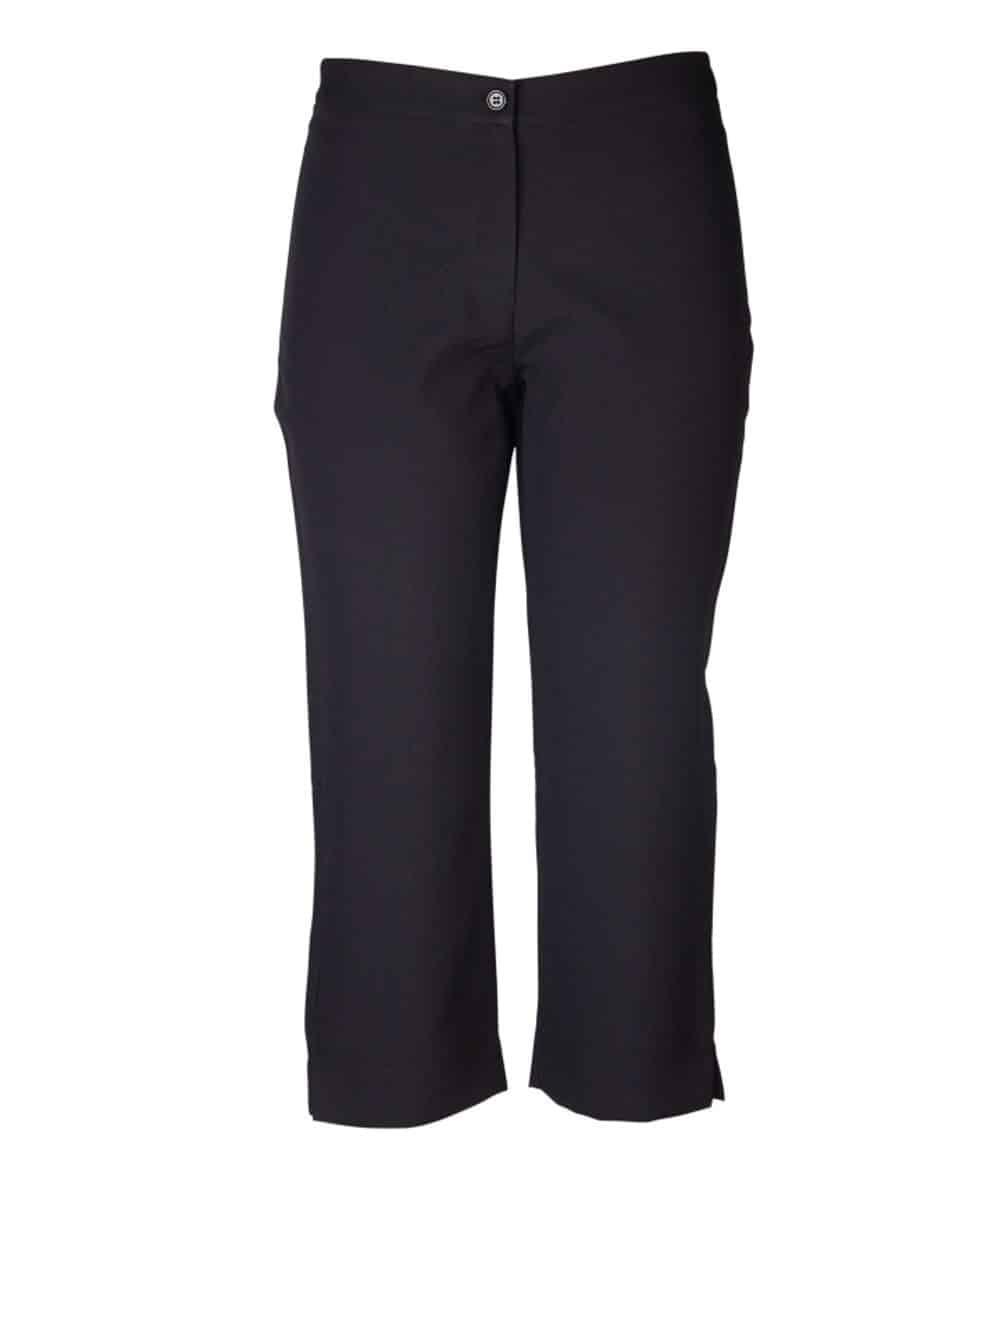 Capri Pants Formal Wear